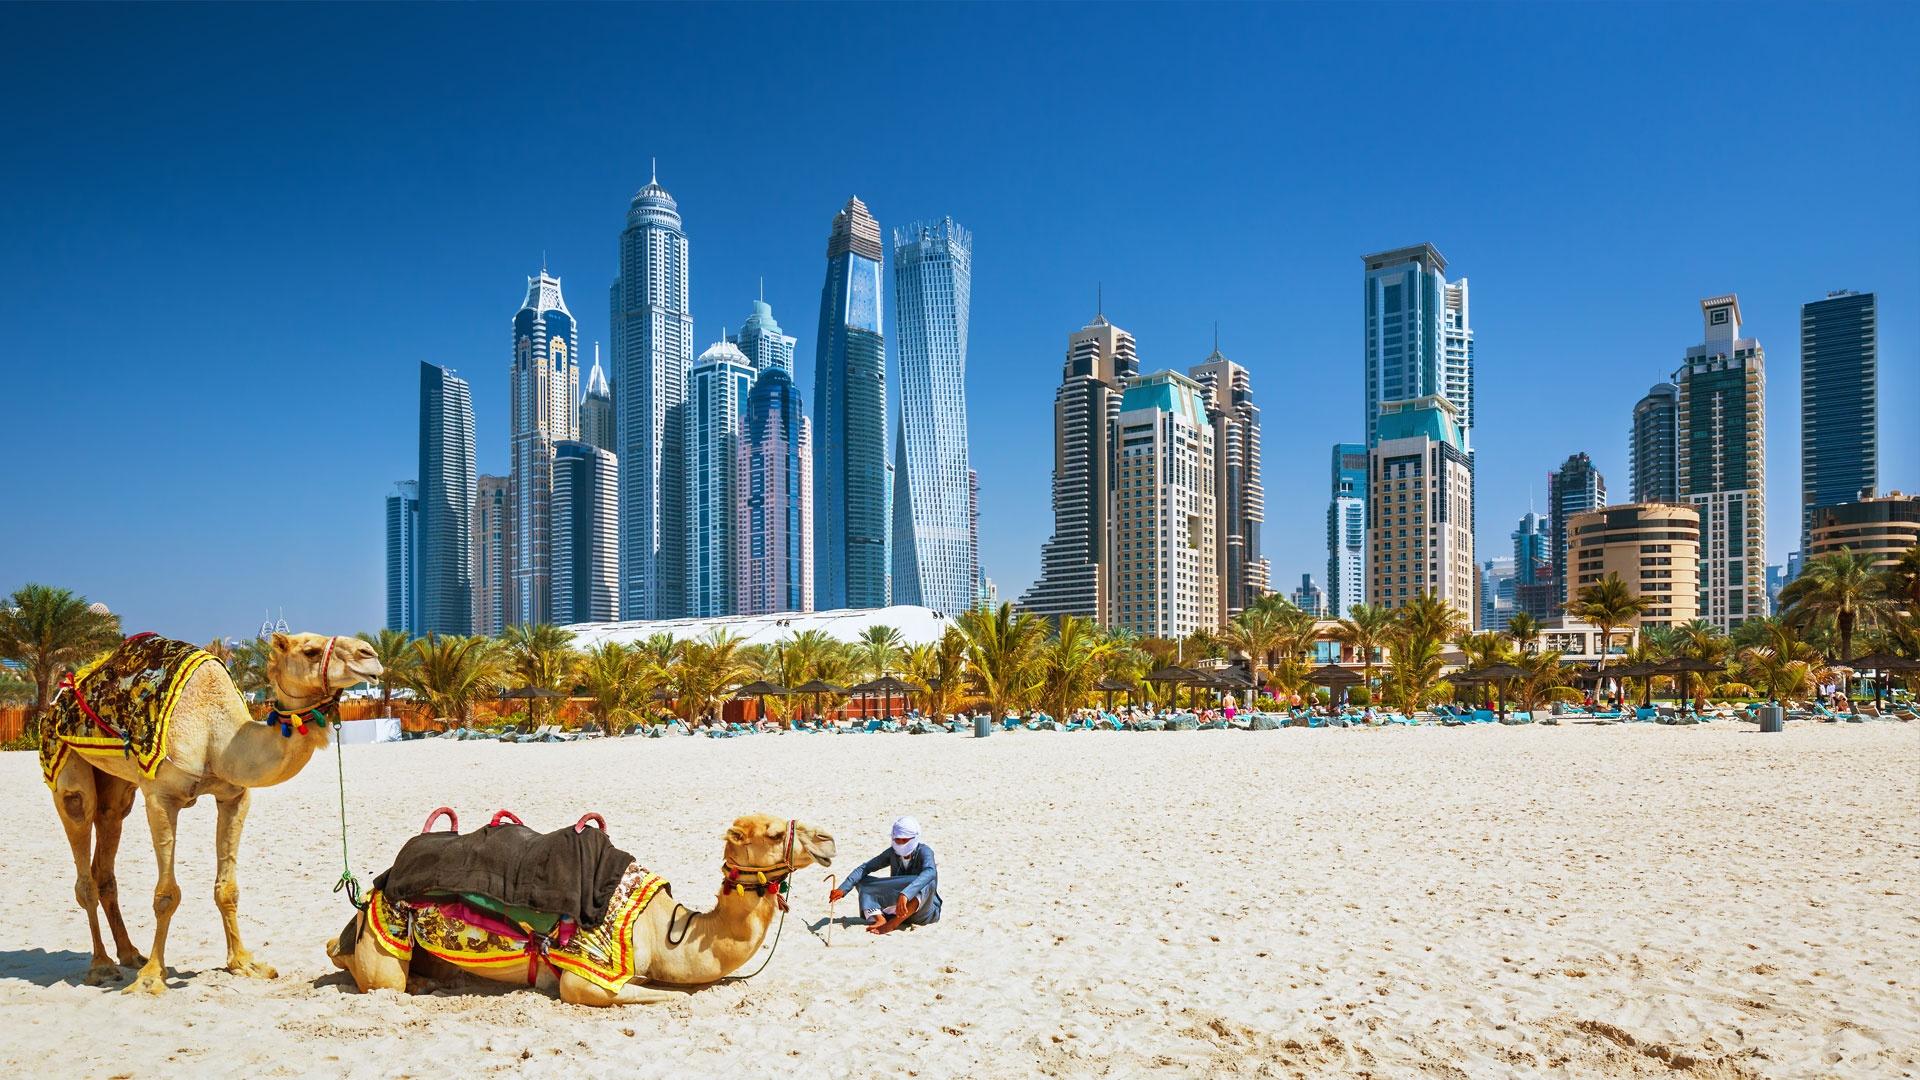 Dubai Wallpaper Image